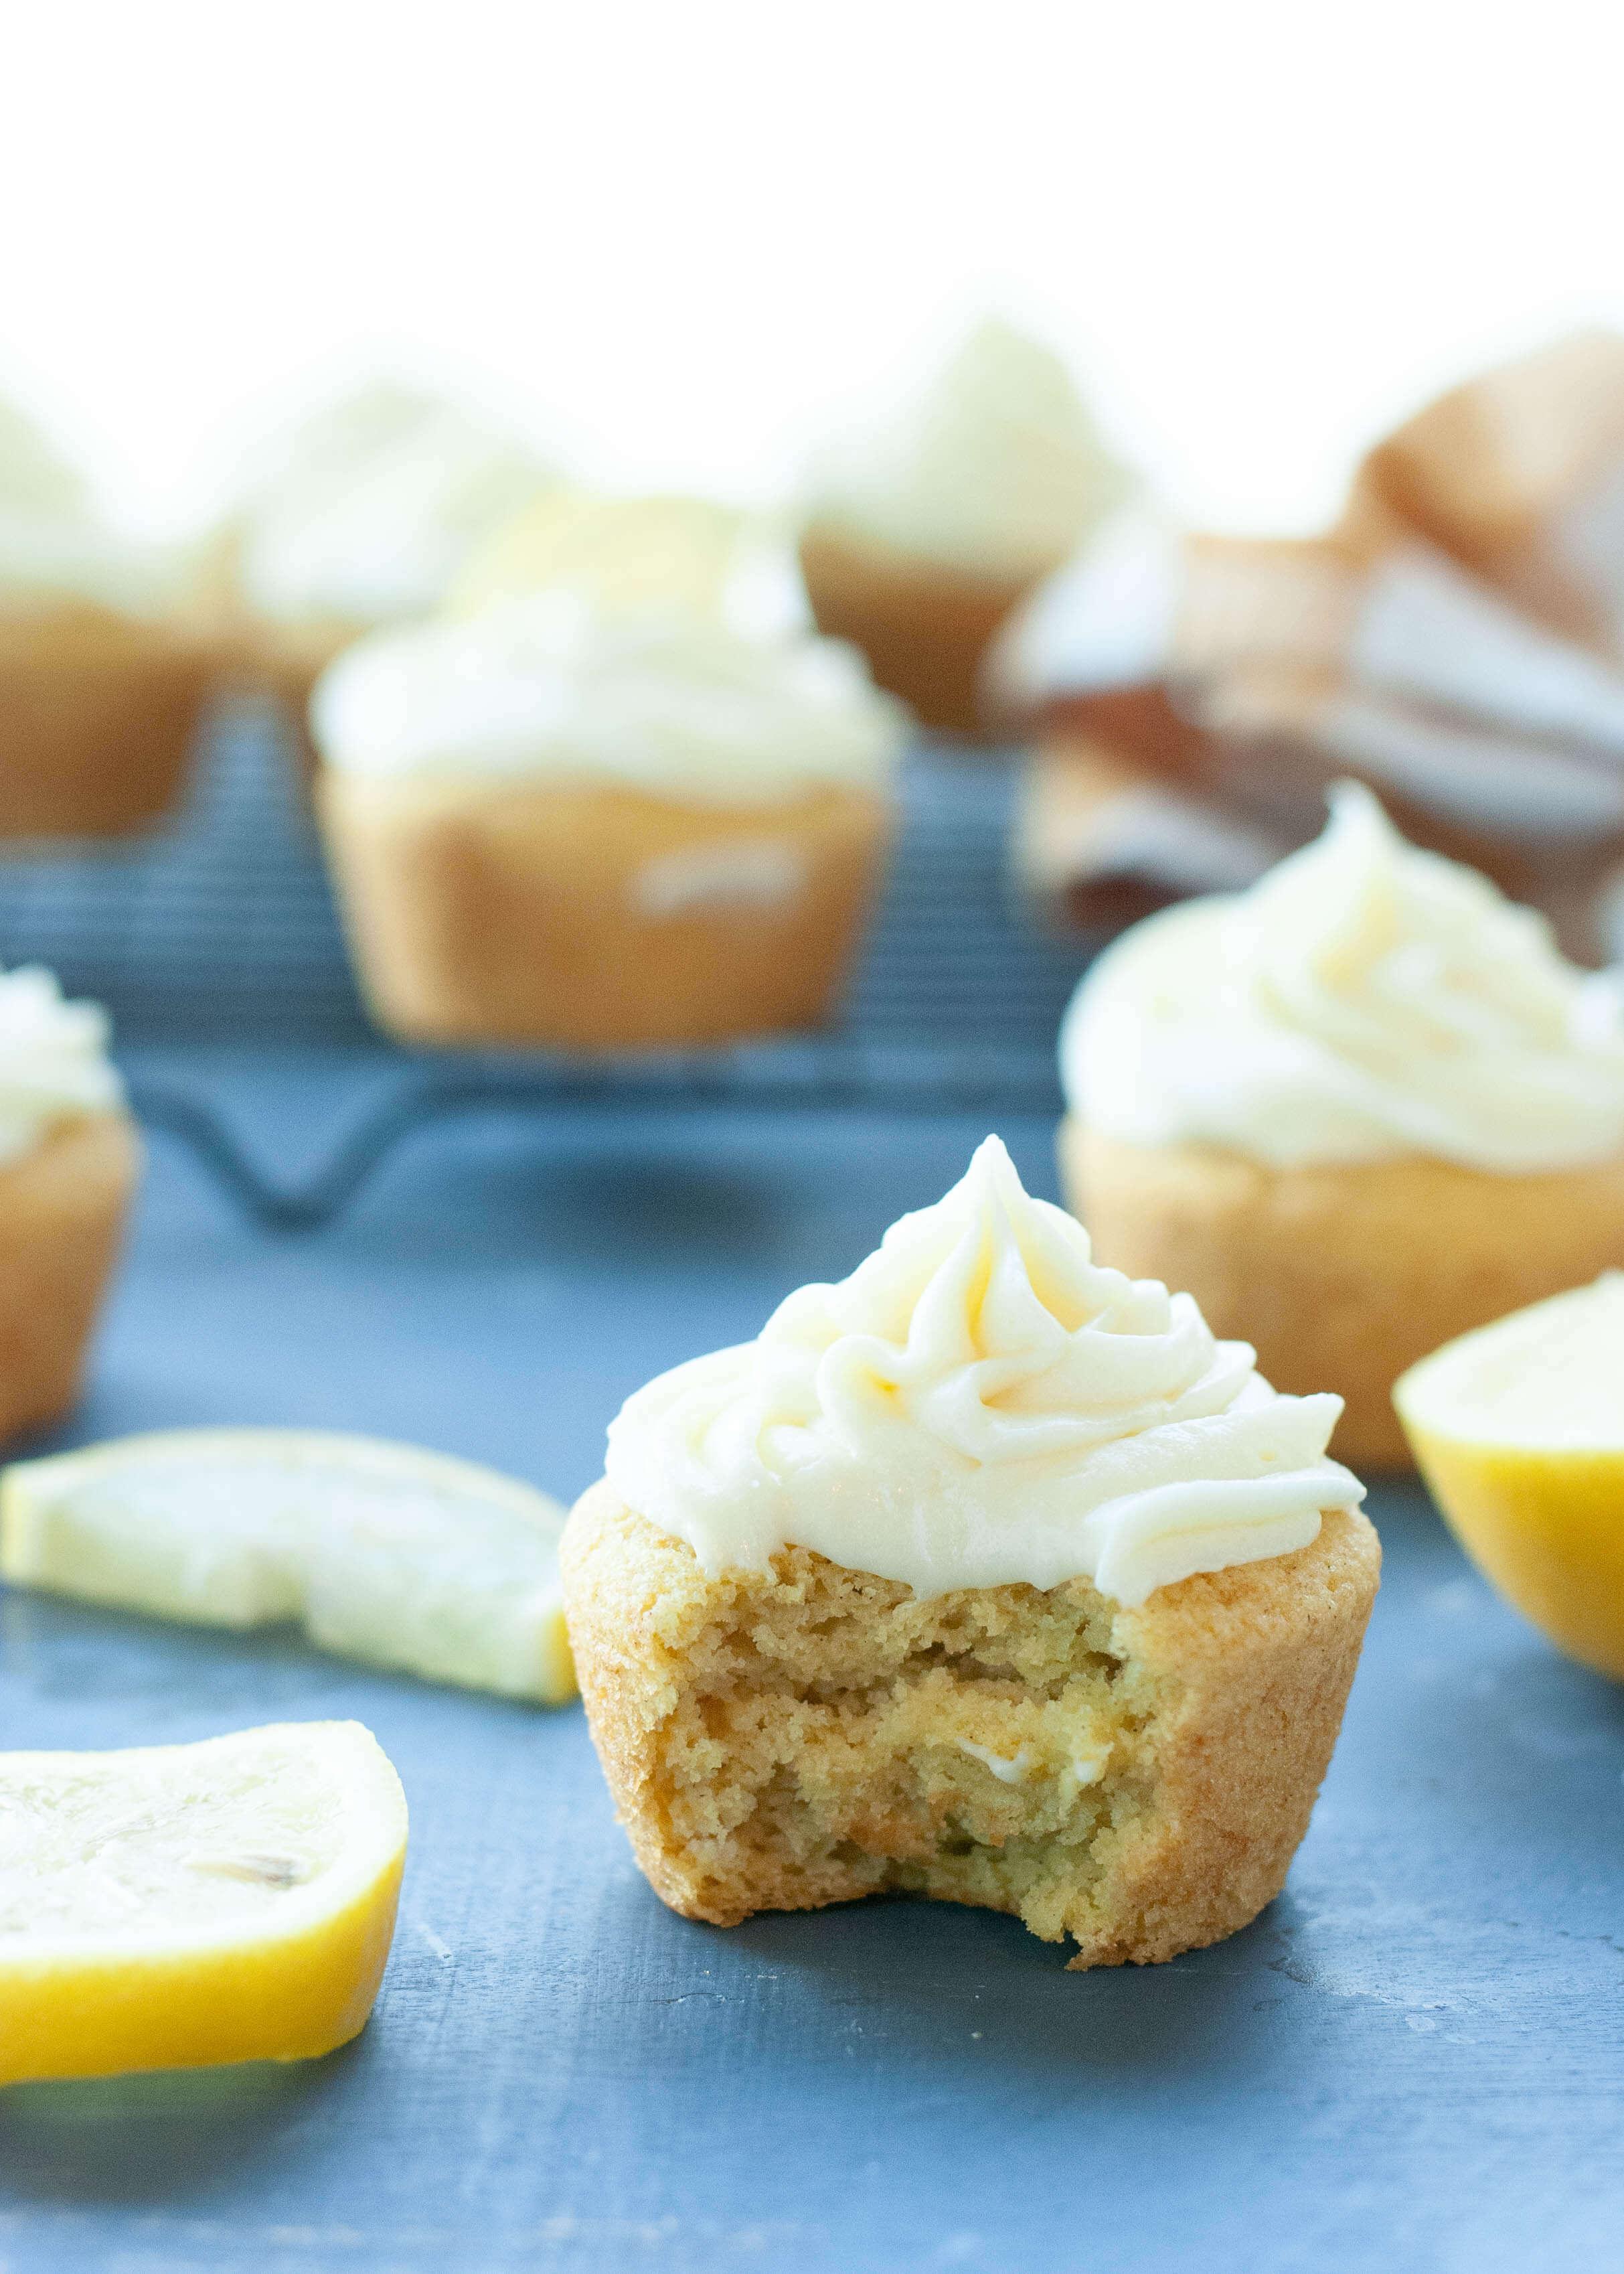 Gluten Free Vegan 3 Ingredient Lemon Cupcakes With Lemon Cream Cheese Frosting